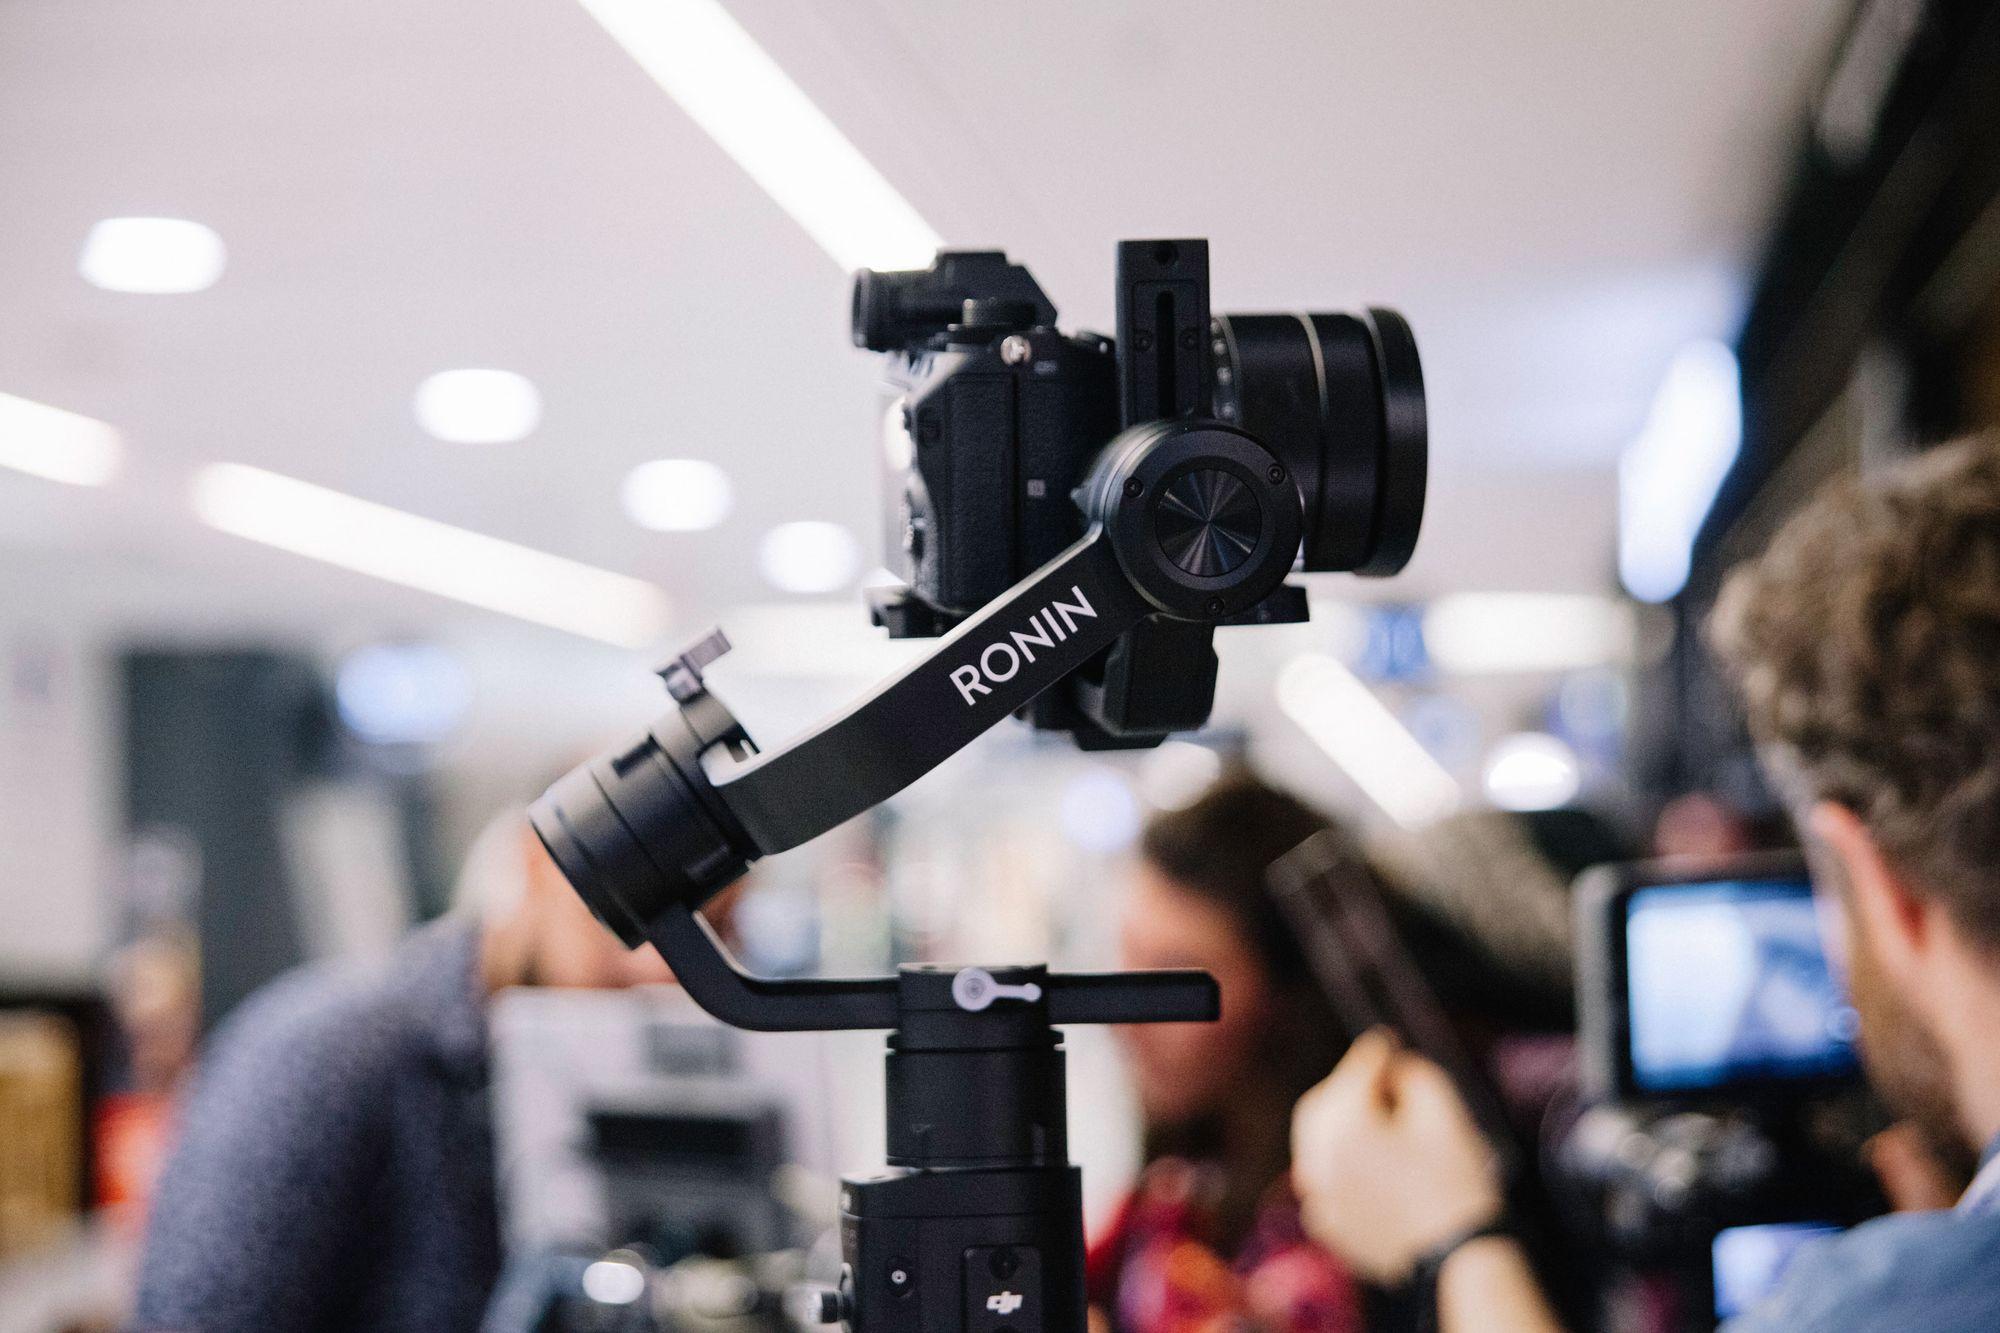 gimbal for shooting cinematic interviews